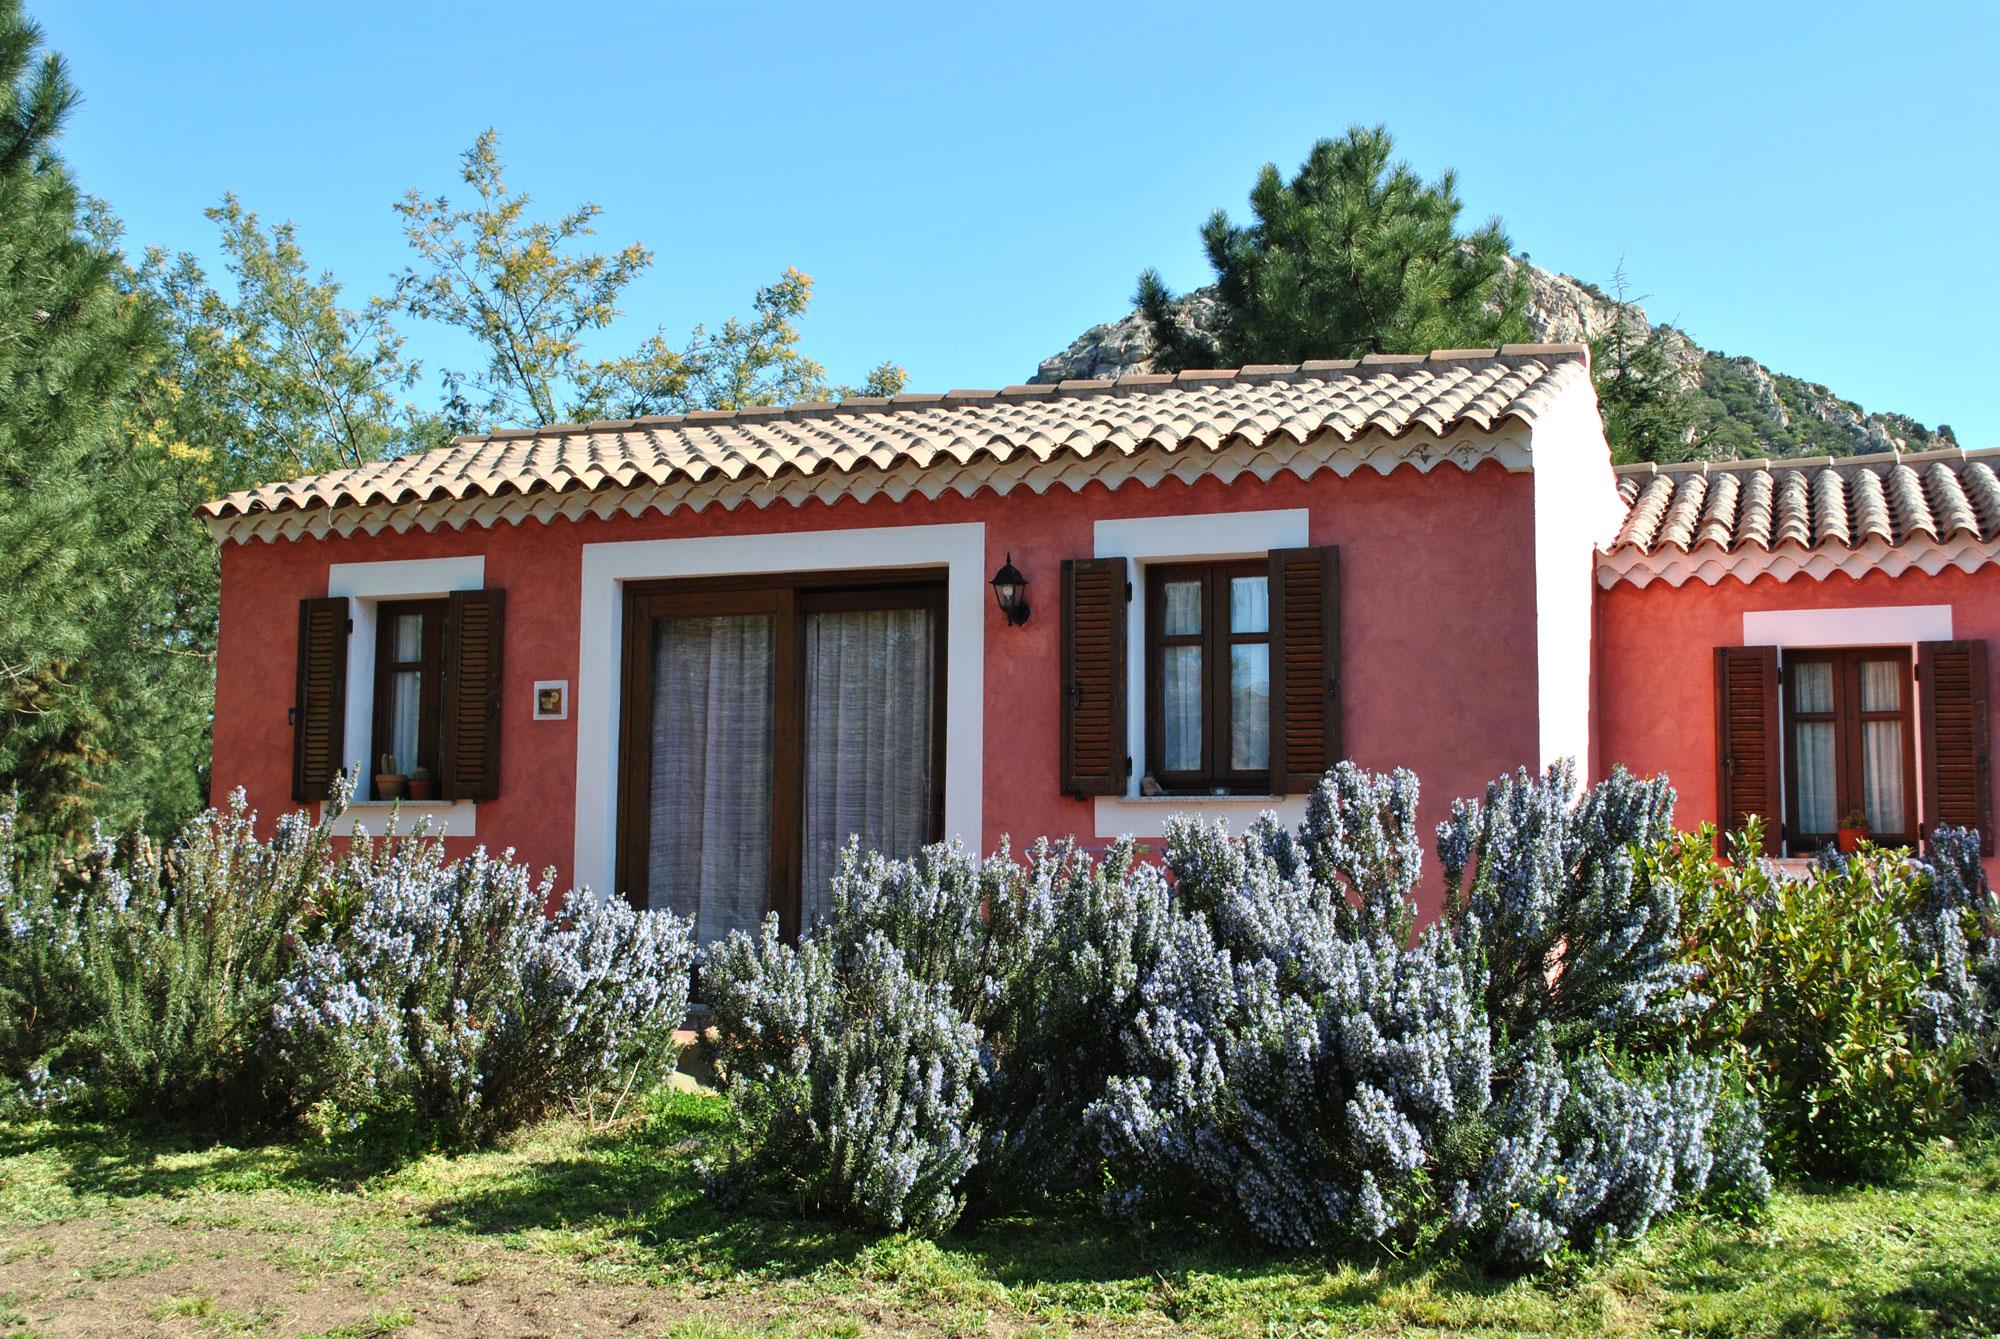 Facciate esterne case di campagna ka42 regardsdefemmes - Simulazione colore esterno casa ...